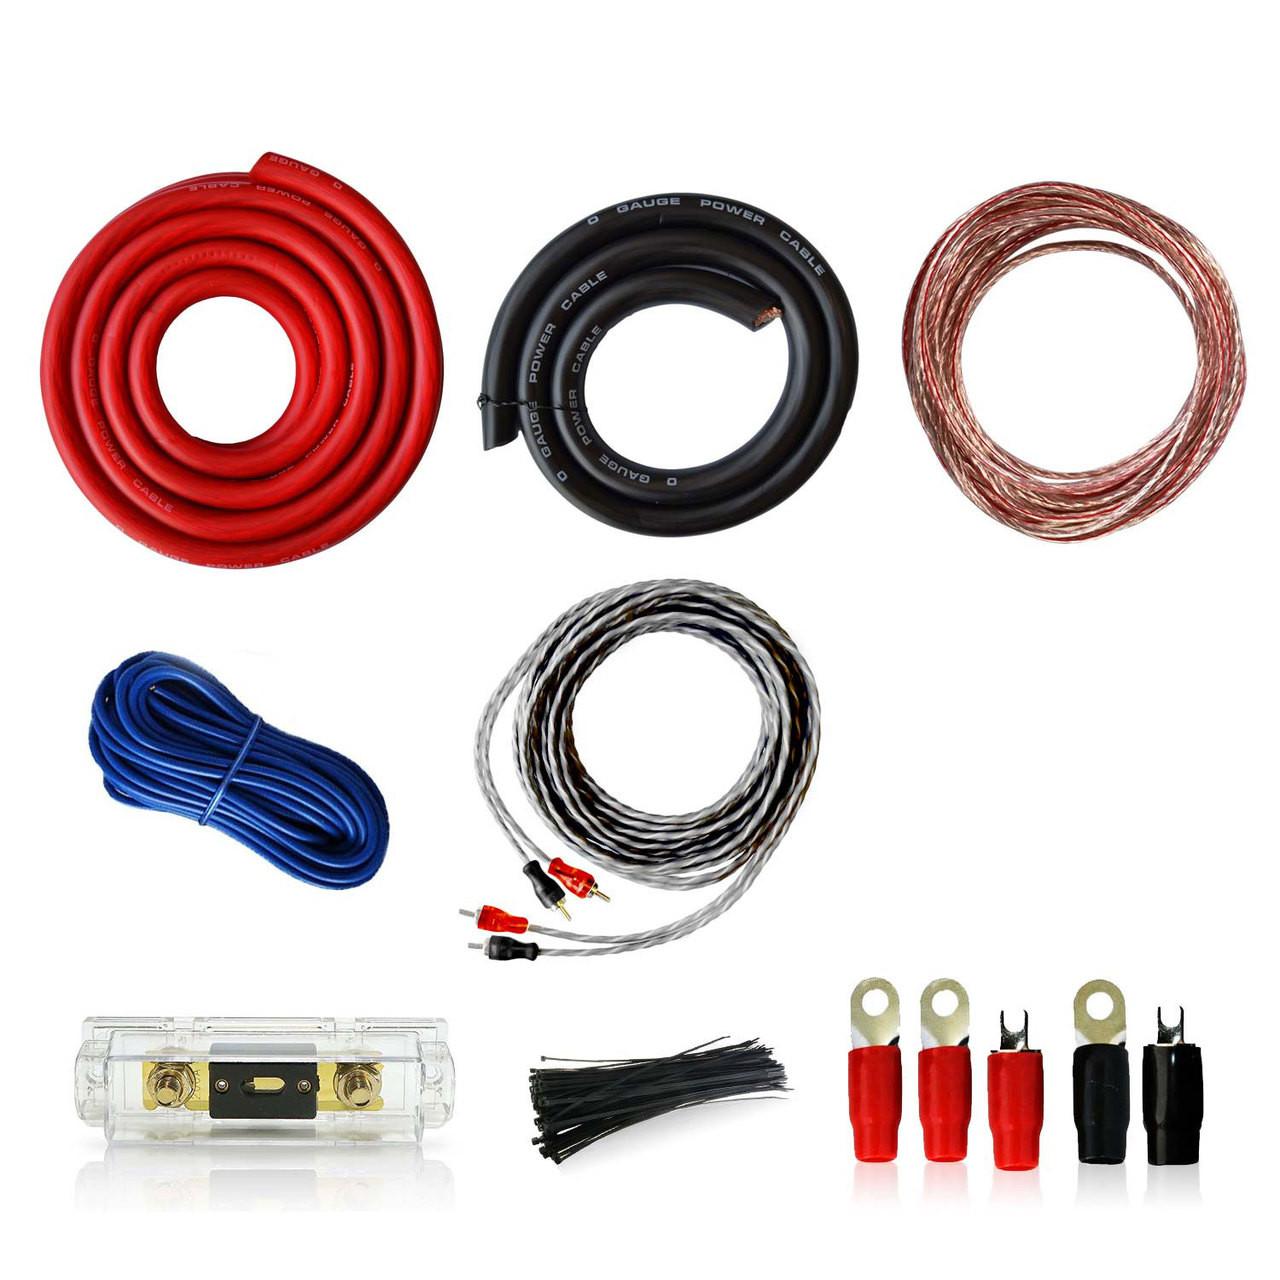 Awesome 0Awg Car Audio Installation Wiring Kit 0 1 Gauge Genssi Wiring Database Mangnorabwedabyuccorg